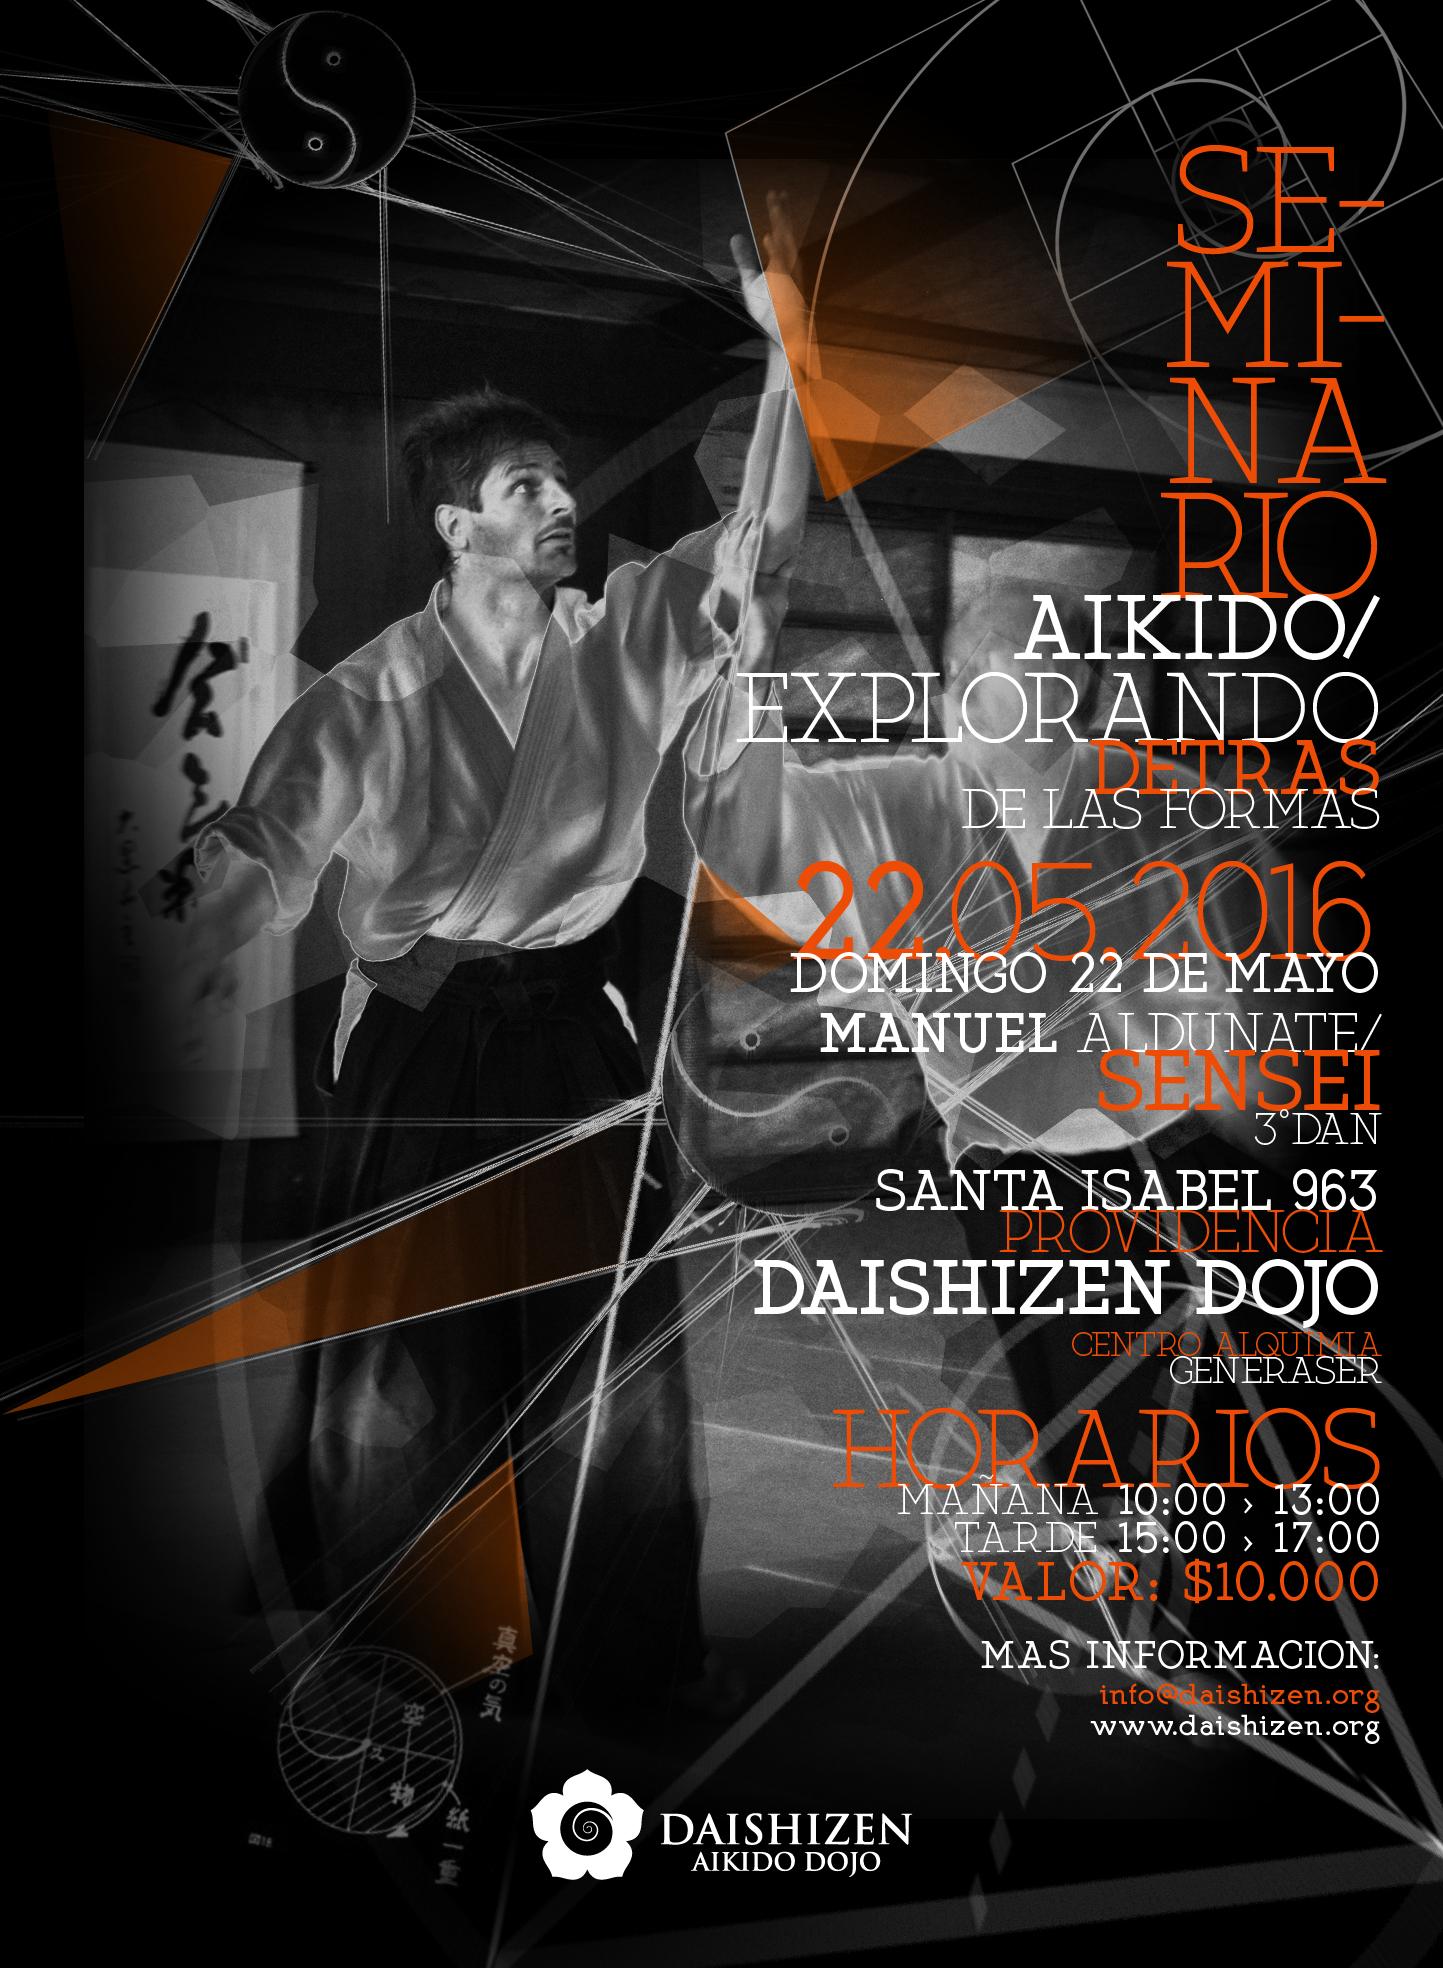 Afiche Seminario Daishizen